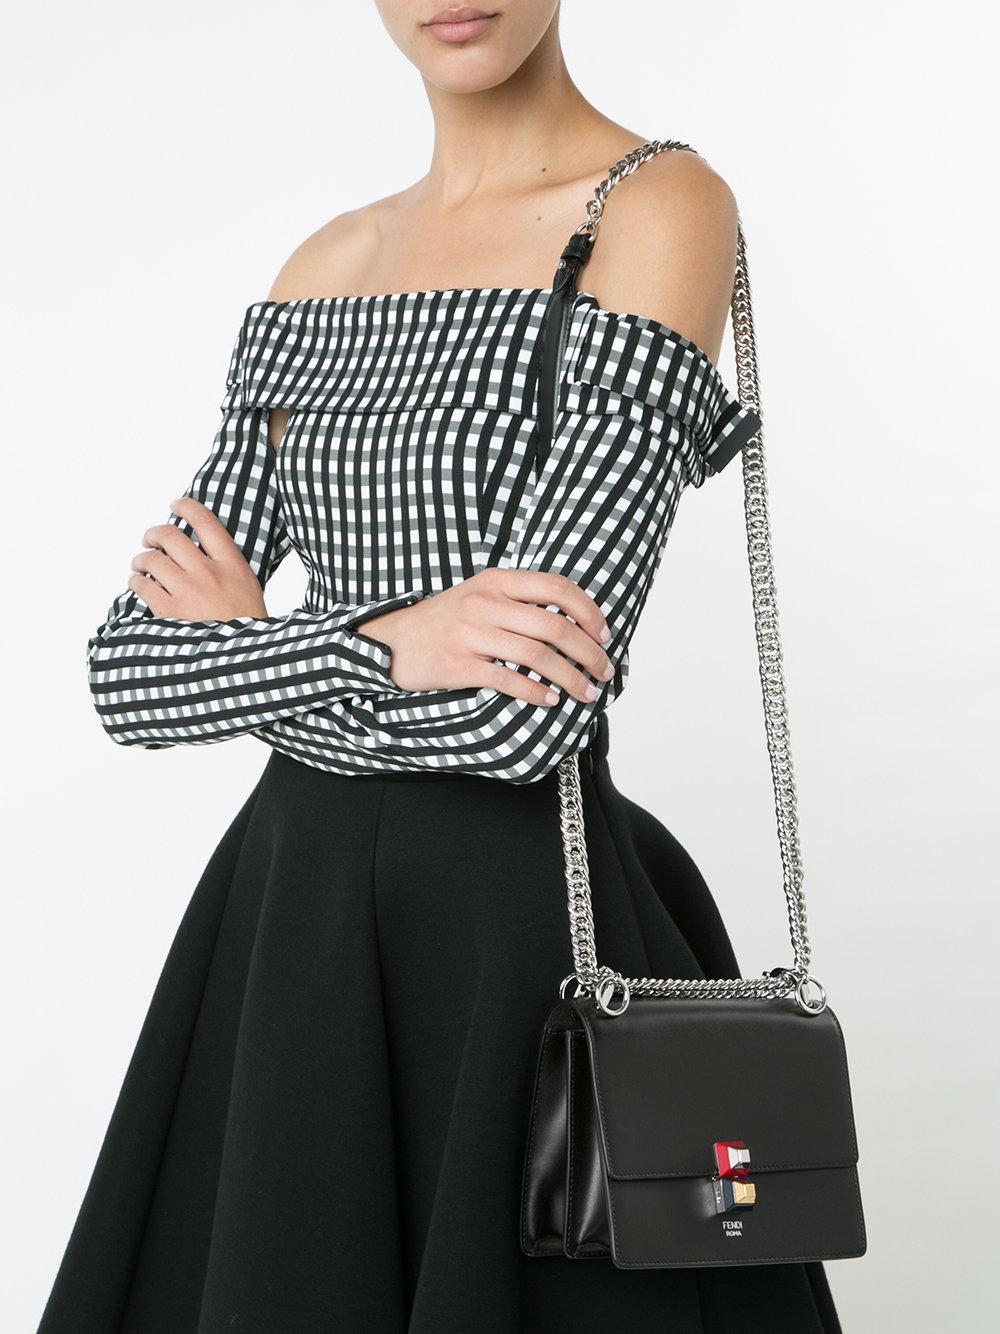 3e1c17703bb1 Fendi Small Kan I Shoulder Bag in Black - Save 10% - Lyst